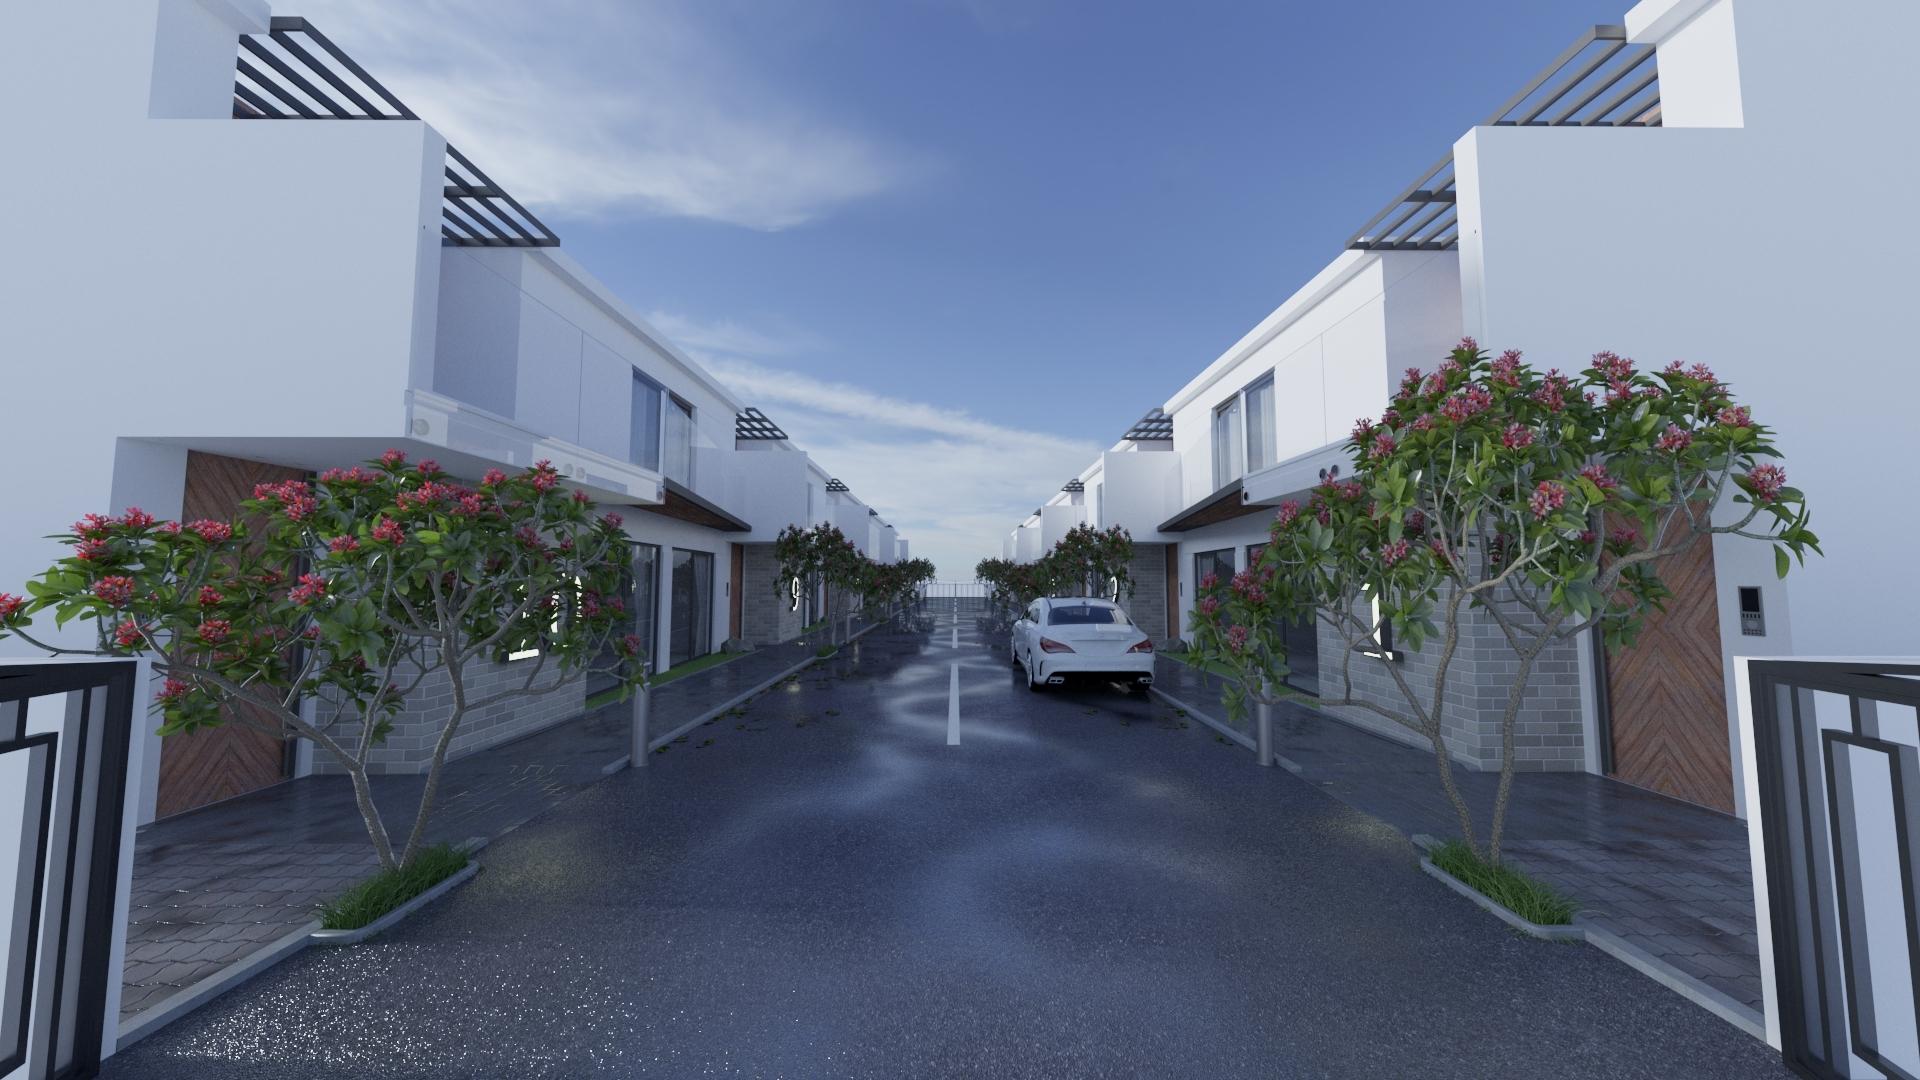 3D housing townhouses